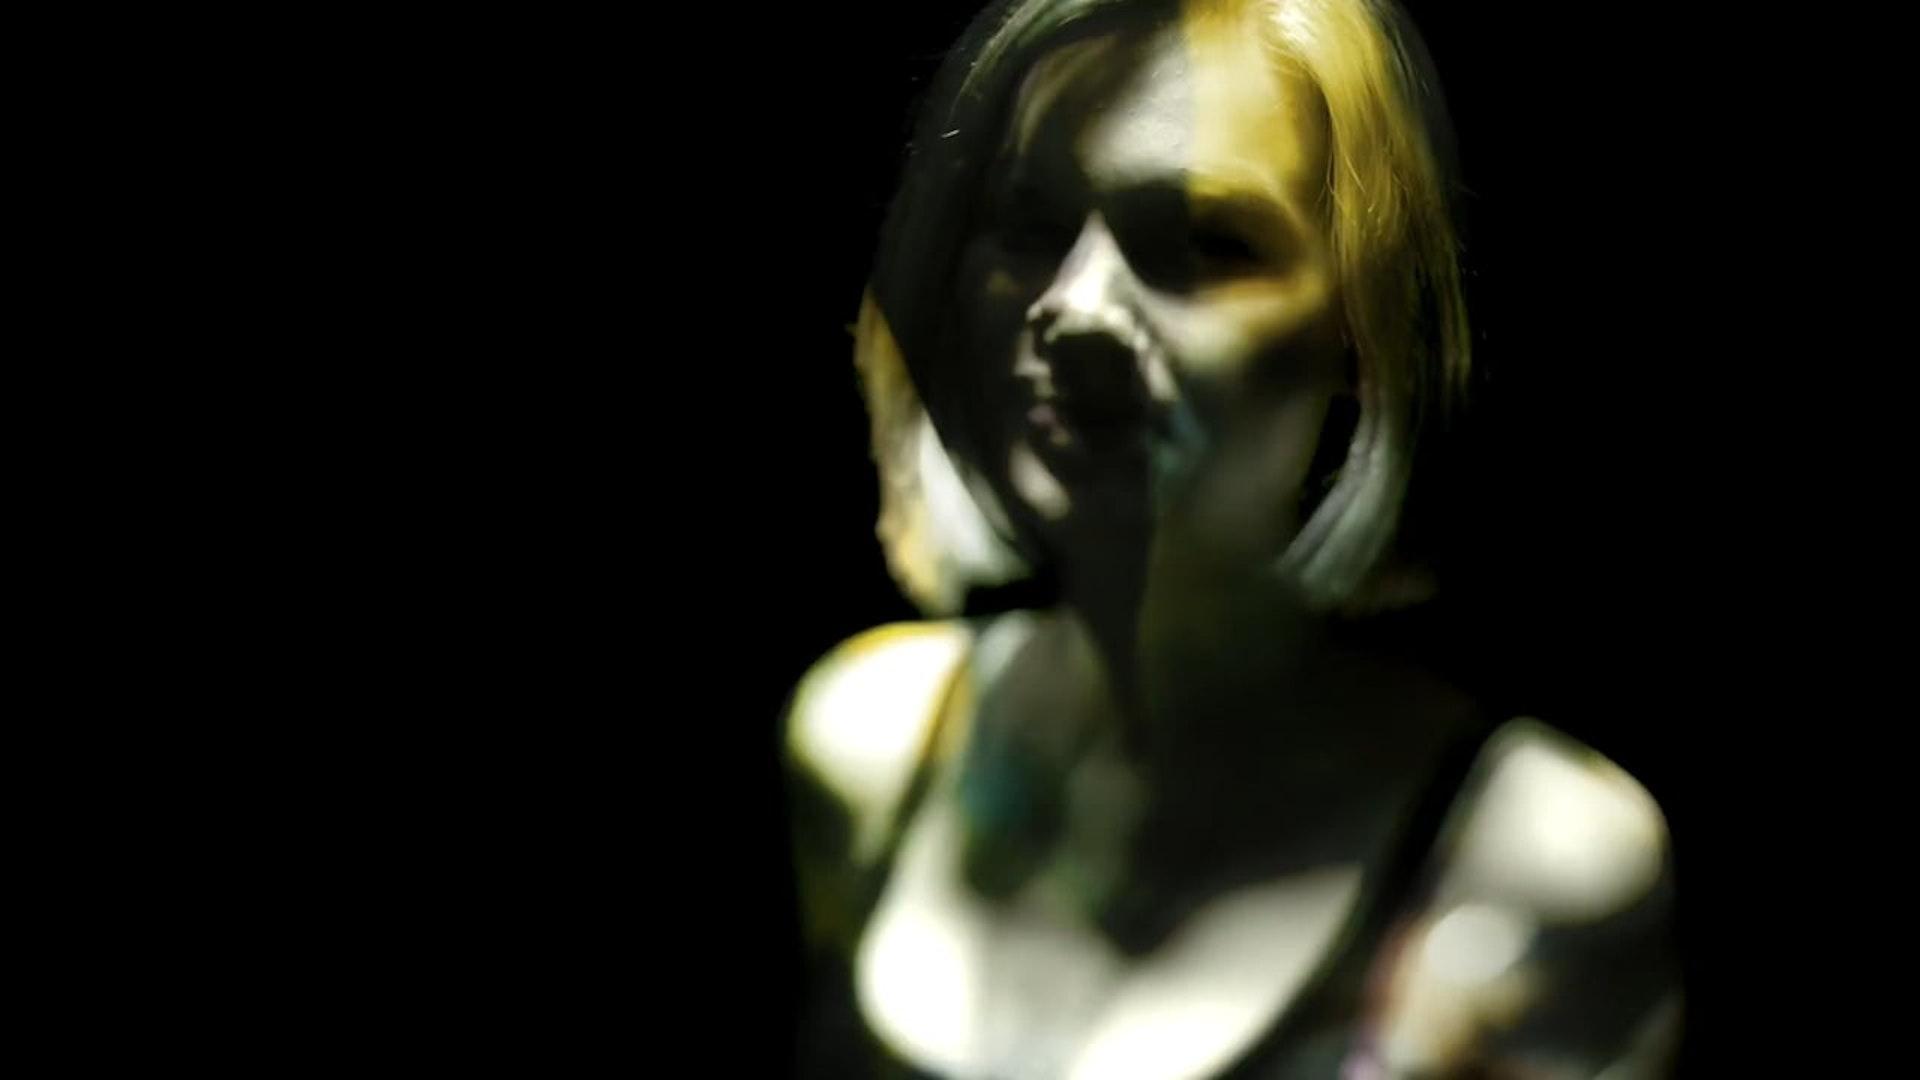 Lullaby - Animal (Music Video)